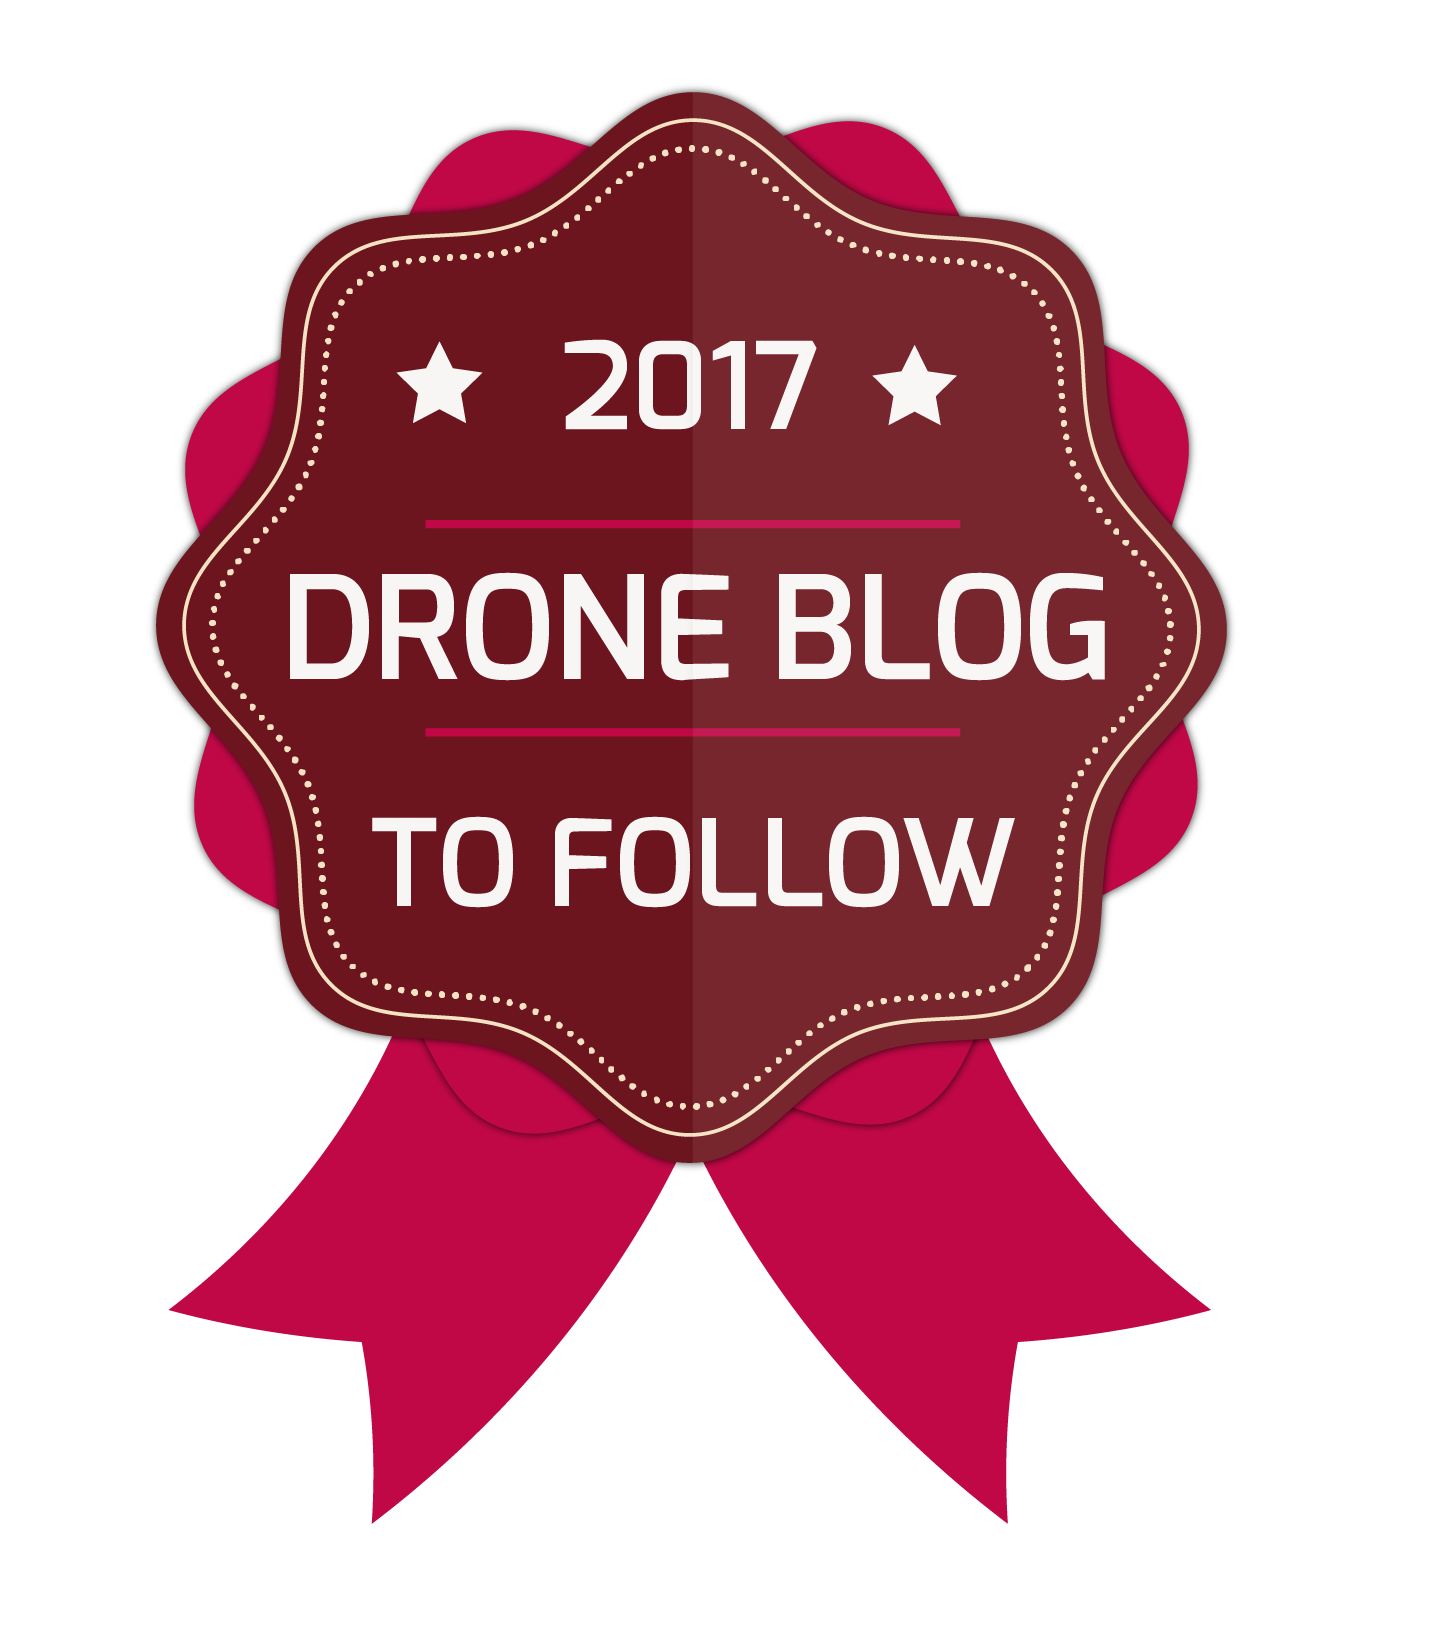 Drone Blog 2017